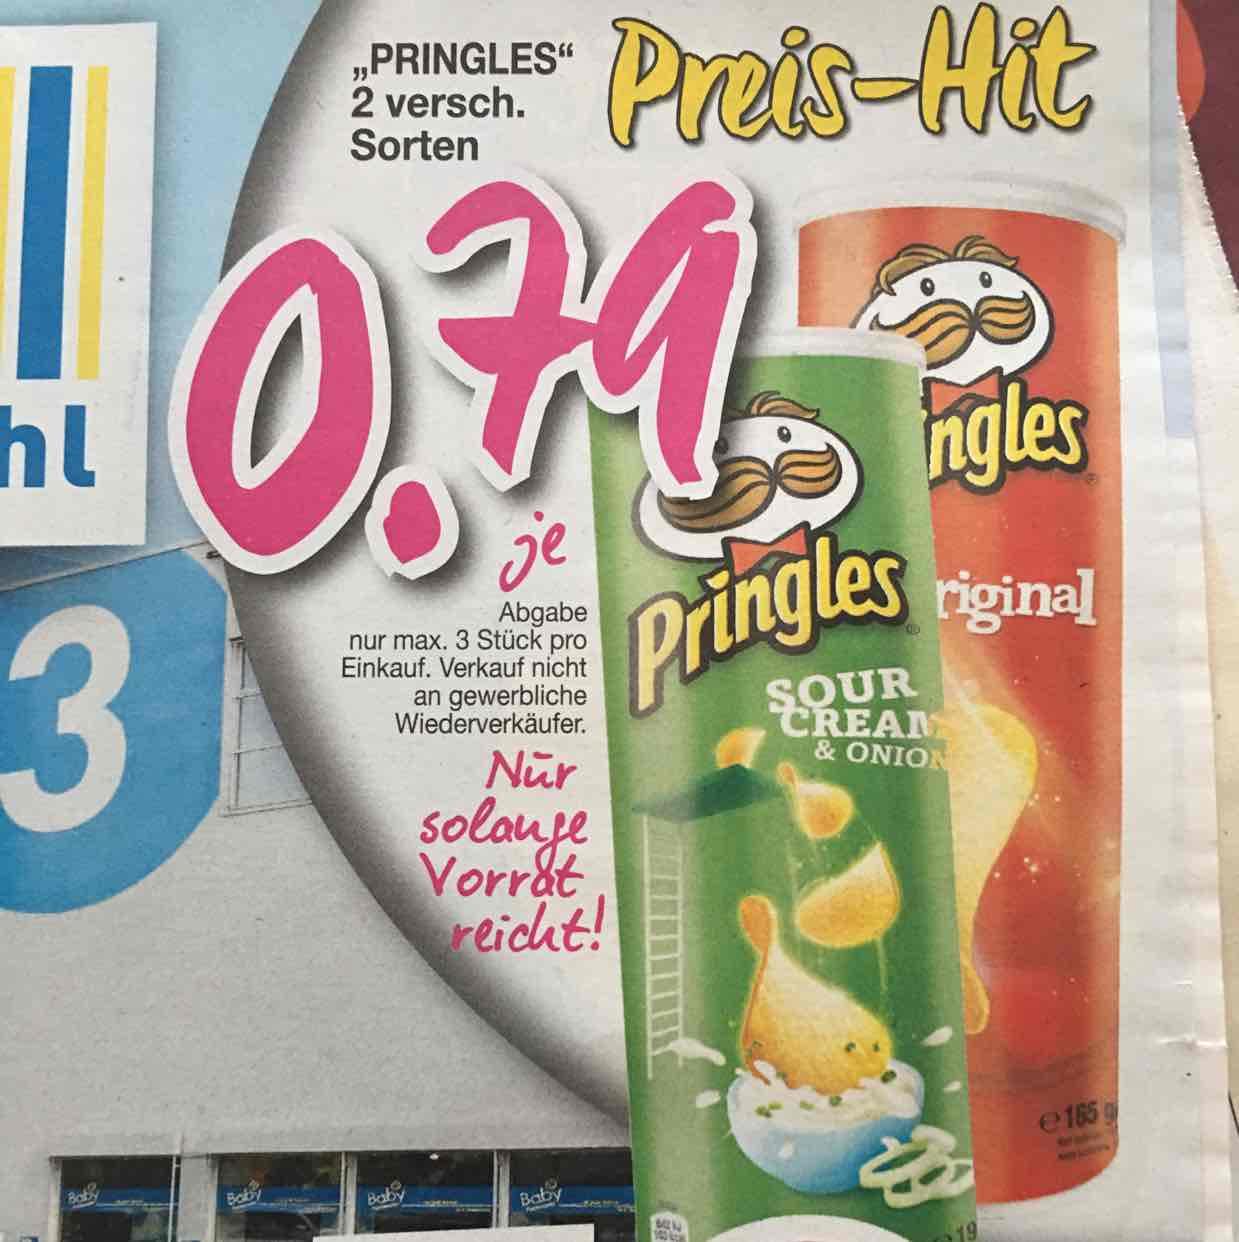 Pringles, SourCream od. Original,79 cent! Lokal Fulda ab 20.02.17